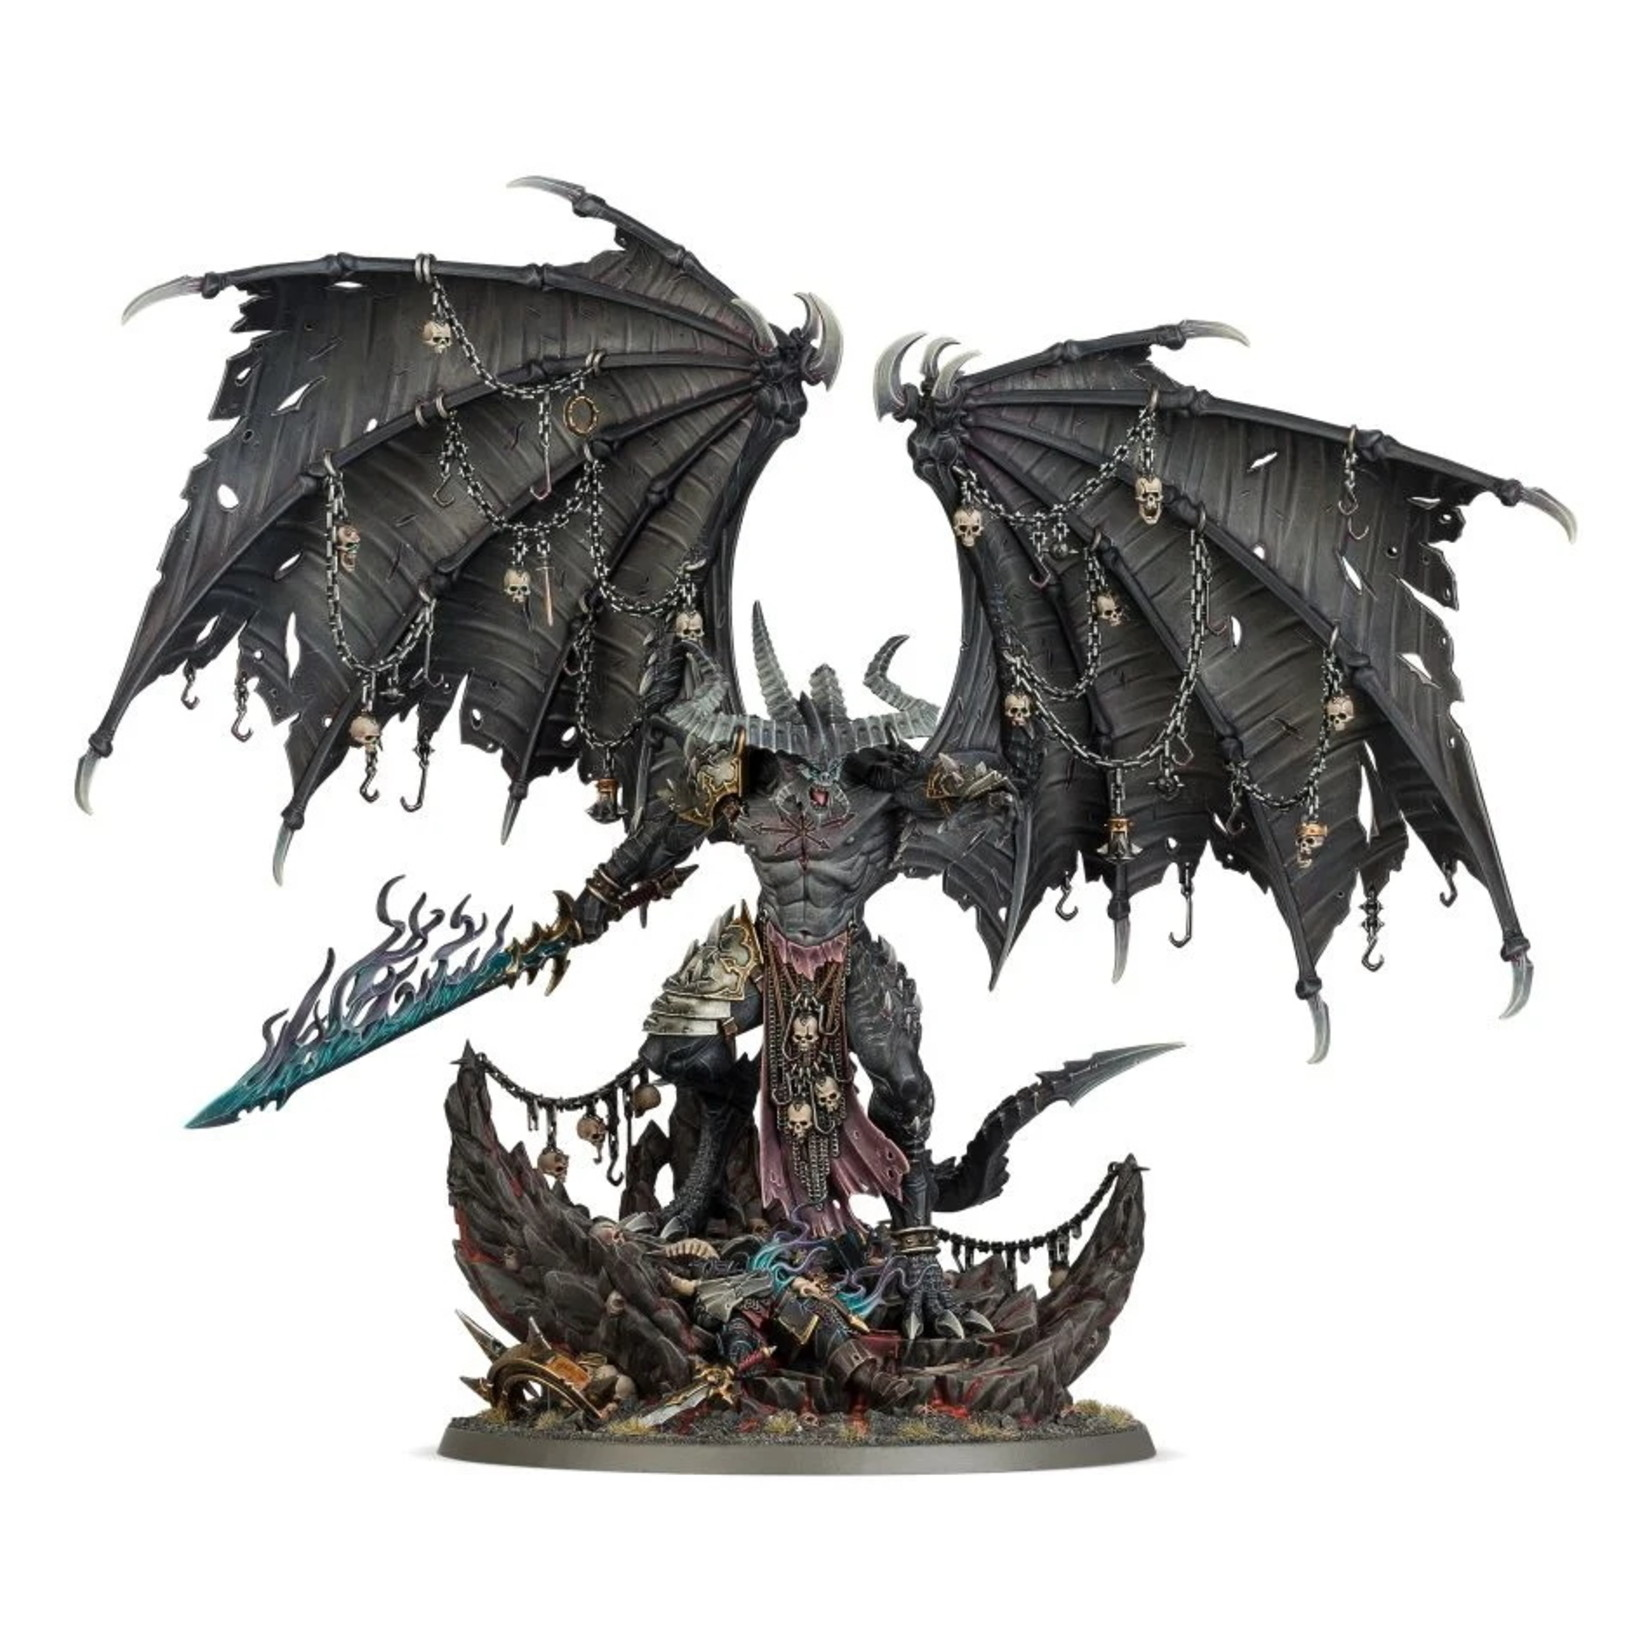 Games Workshop Be'lakor, the Dark Master